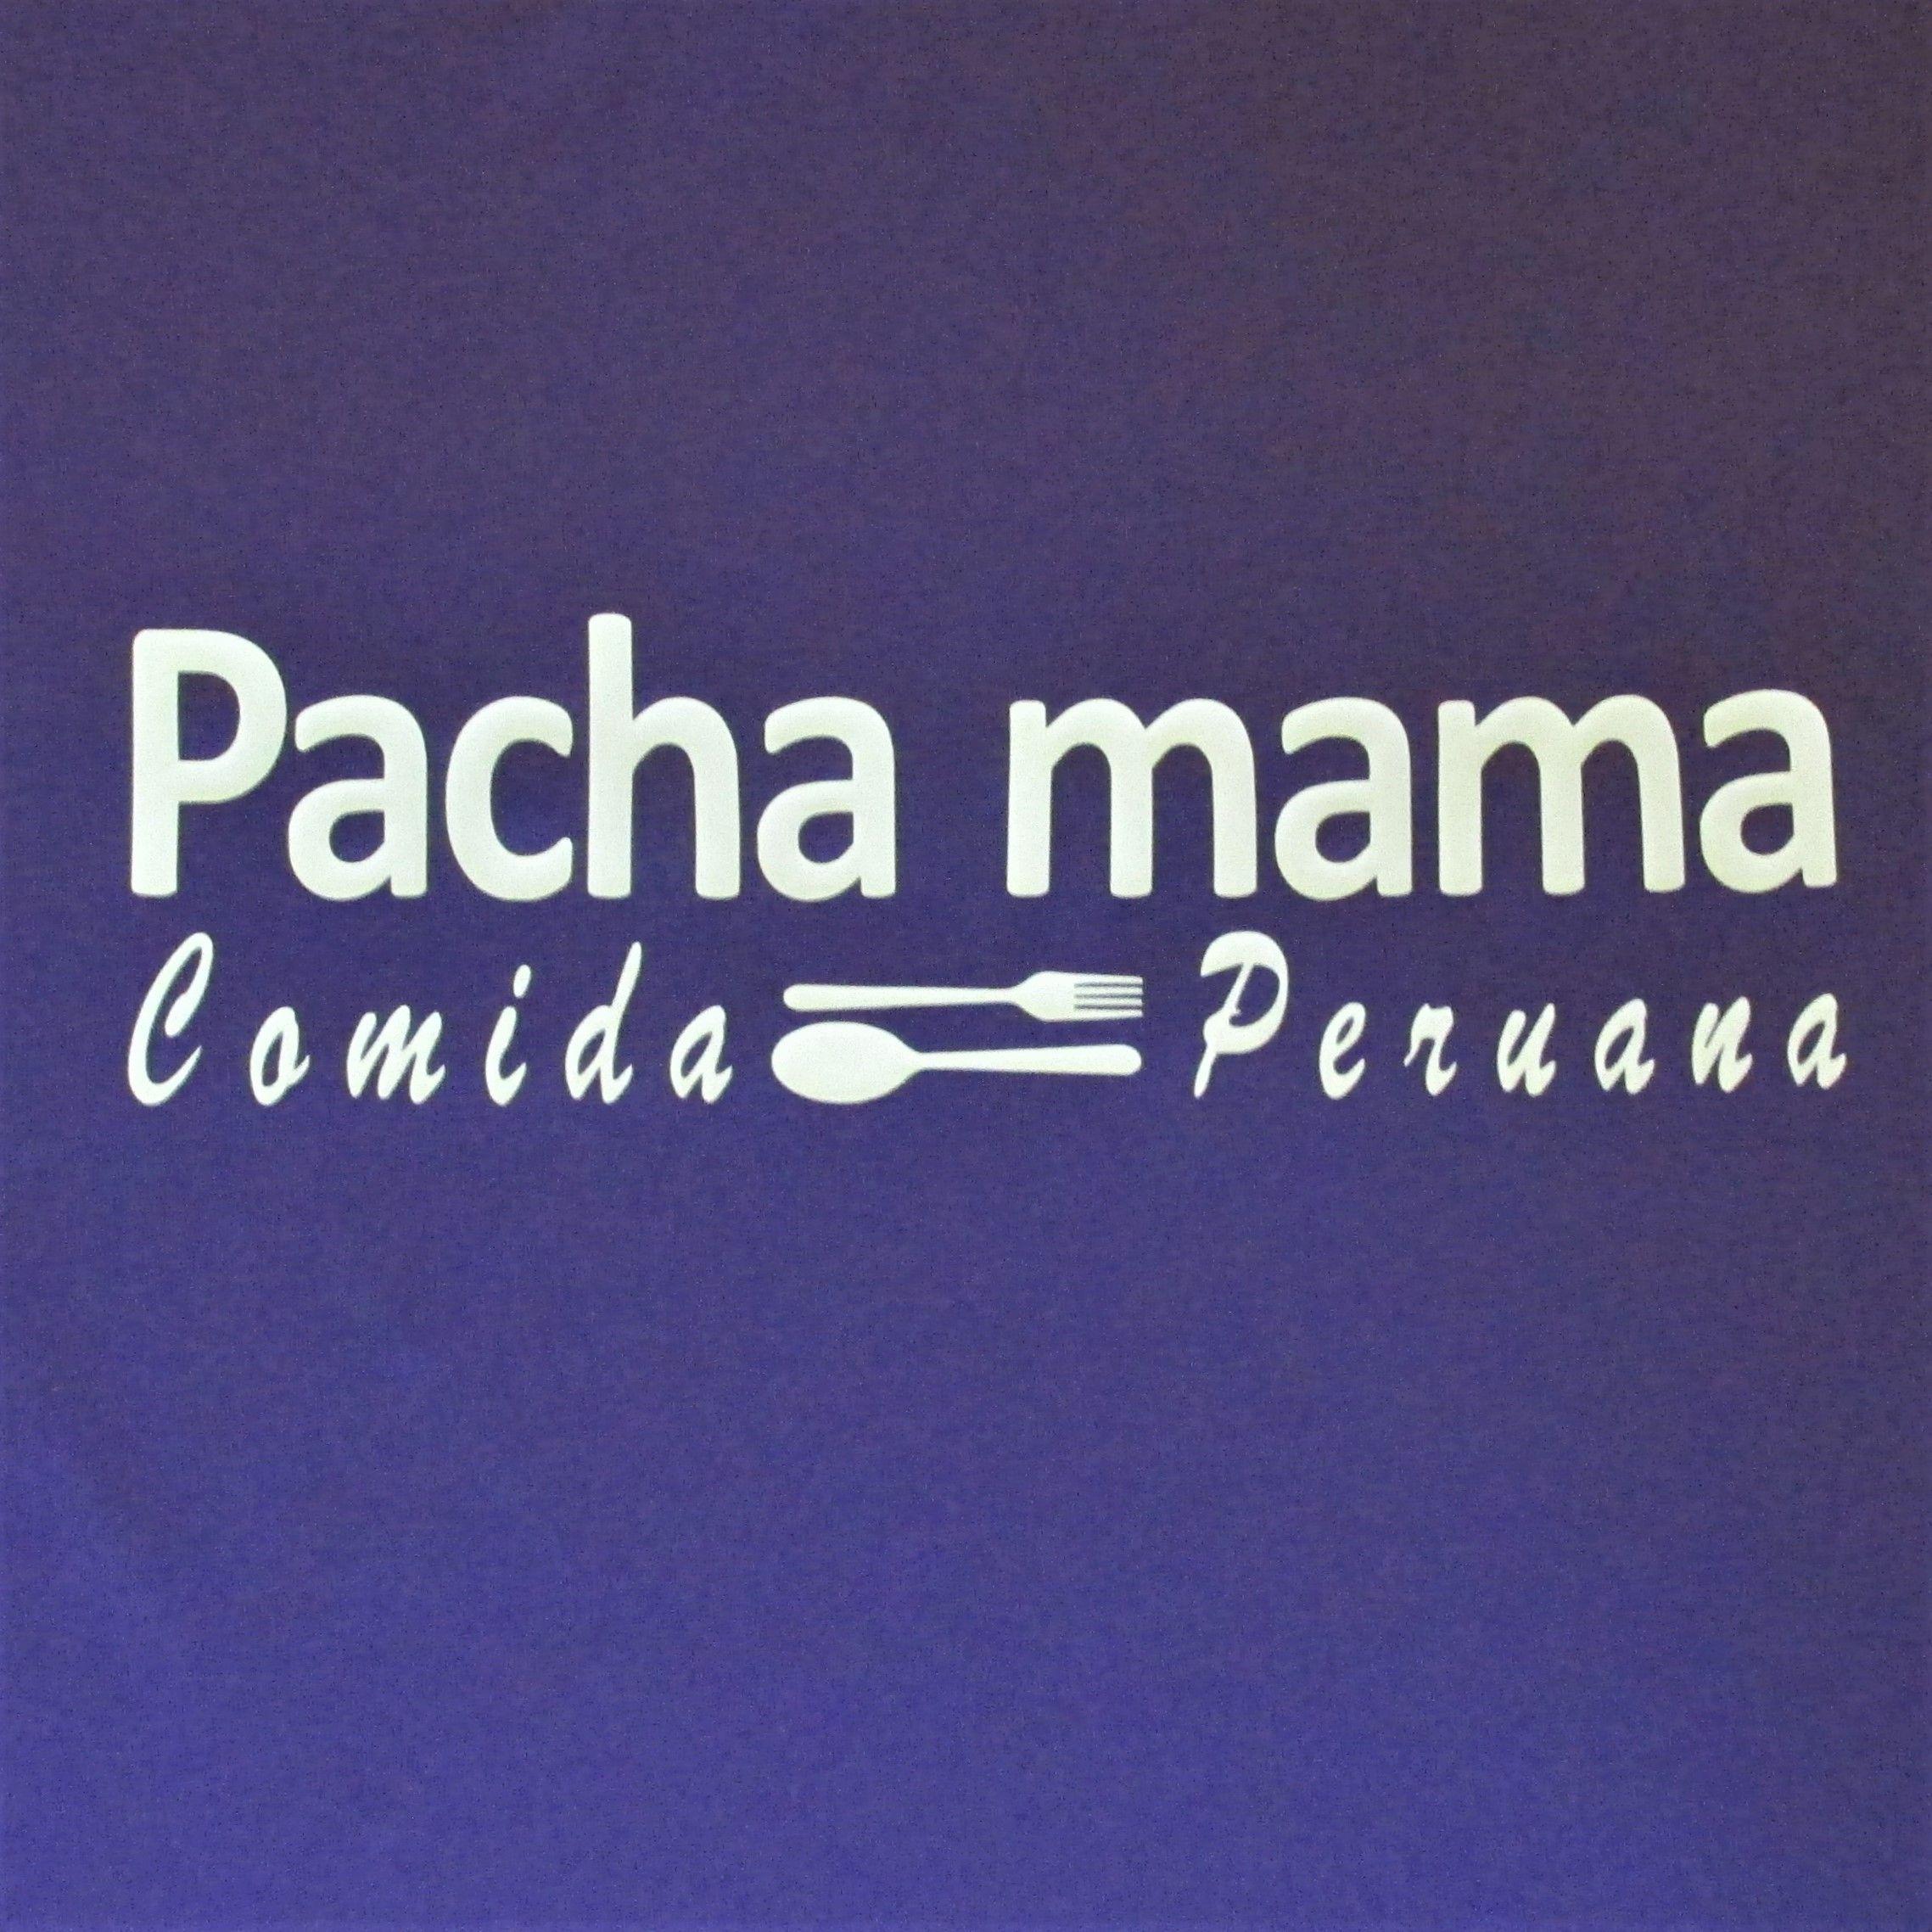 Diseño publicidad Pacha mama en vinilo textil.  botextilprint  serigrafia   bordado  vinilotextil b00e9b271b188